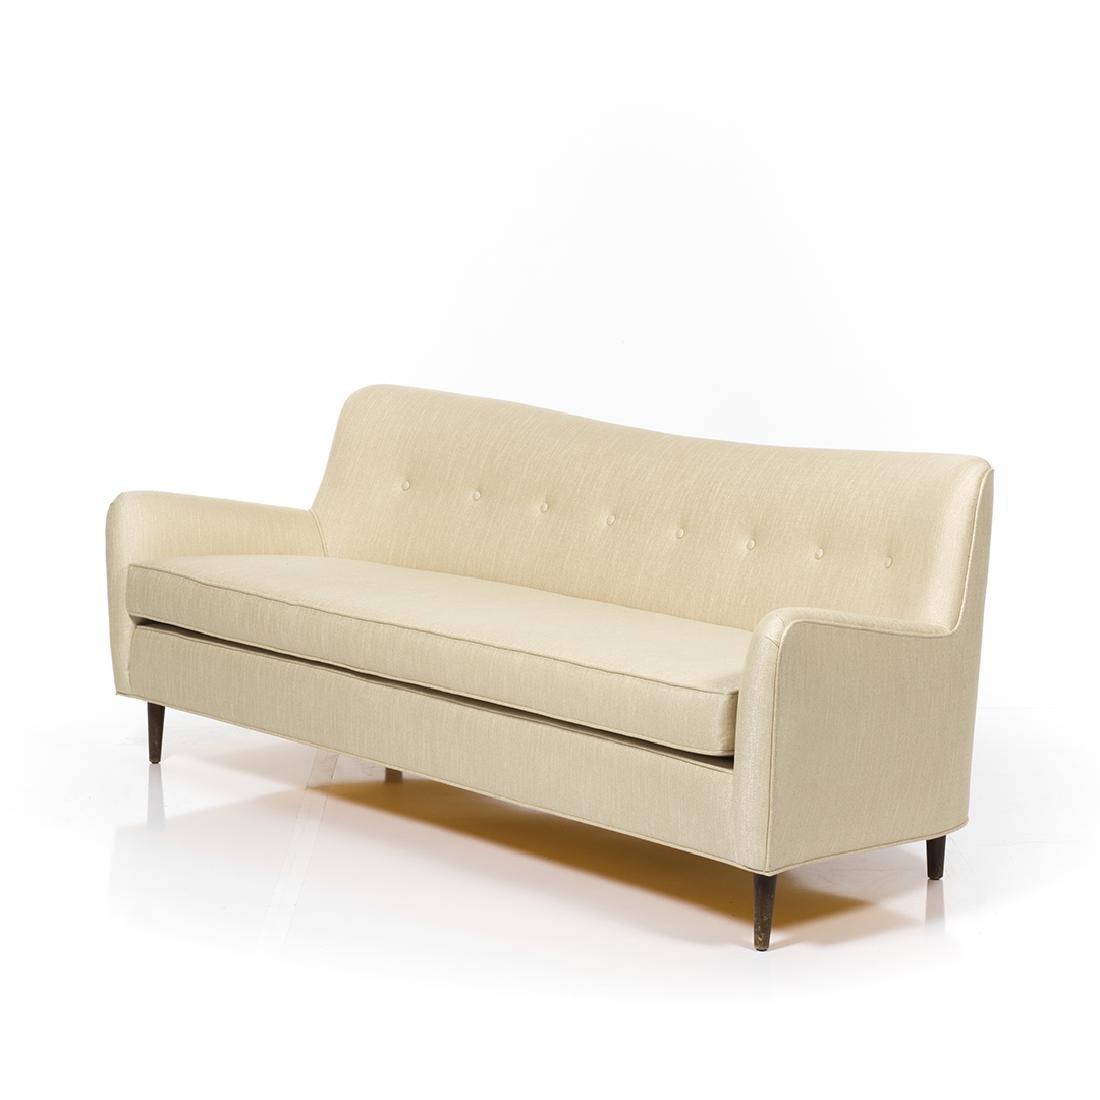 Gio Ponti Style Sofa - 2